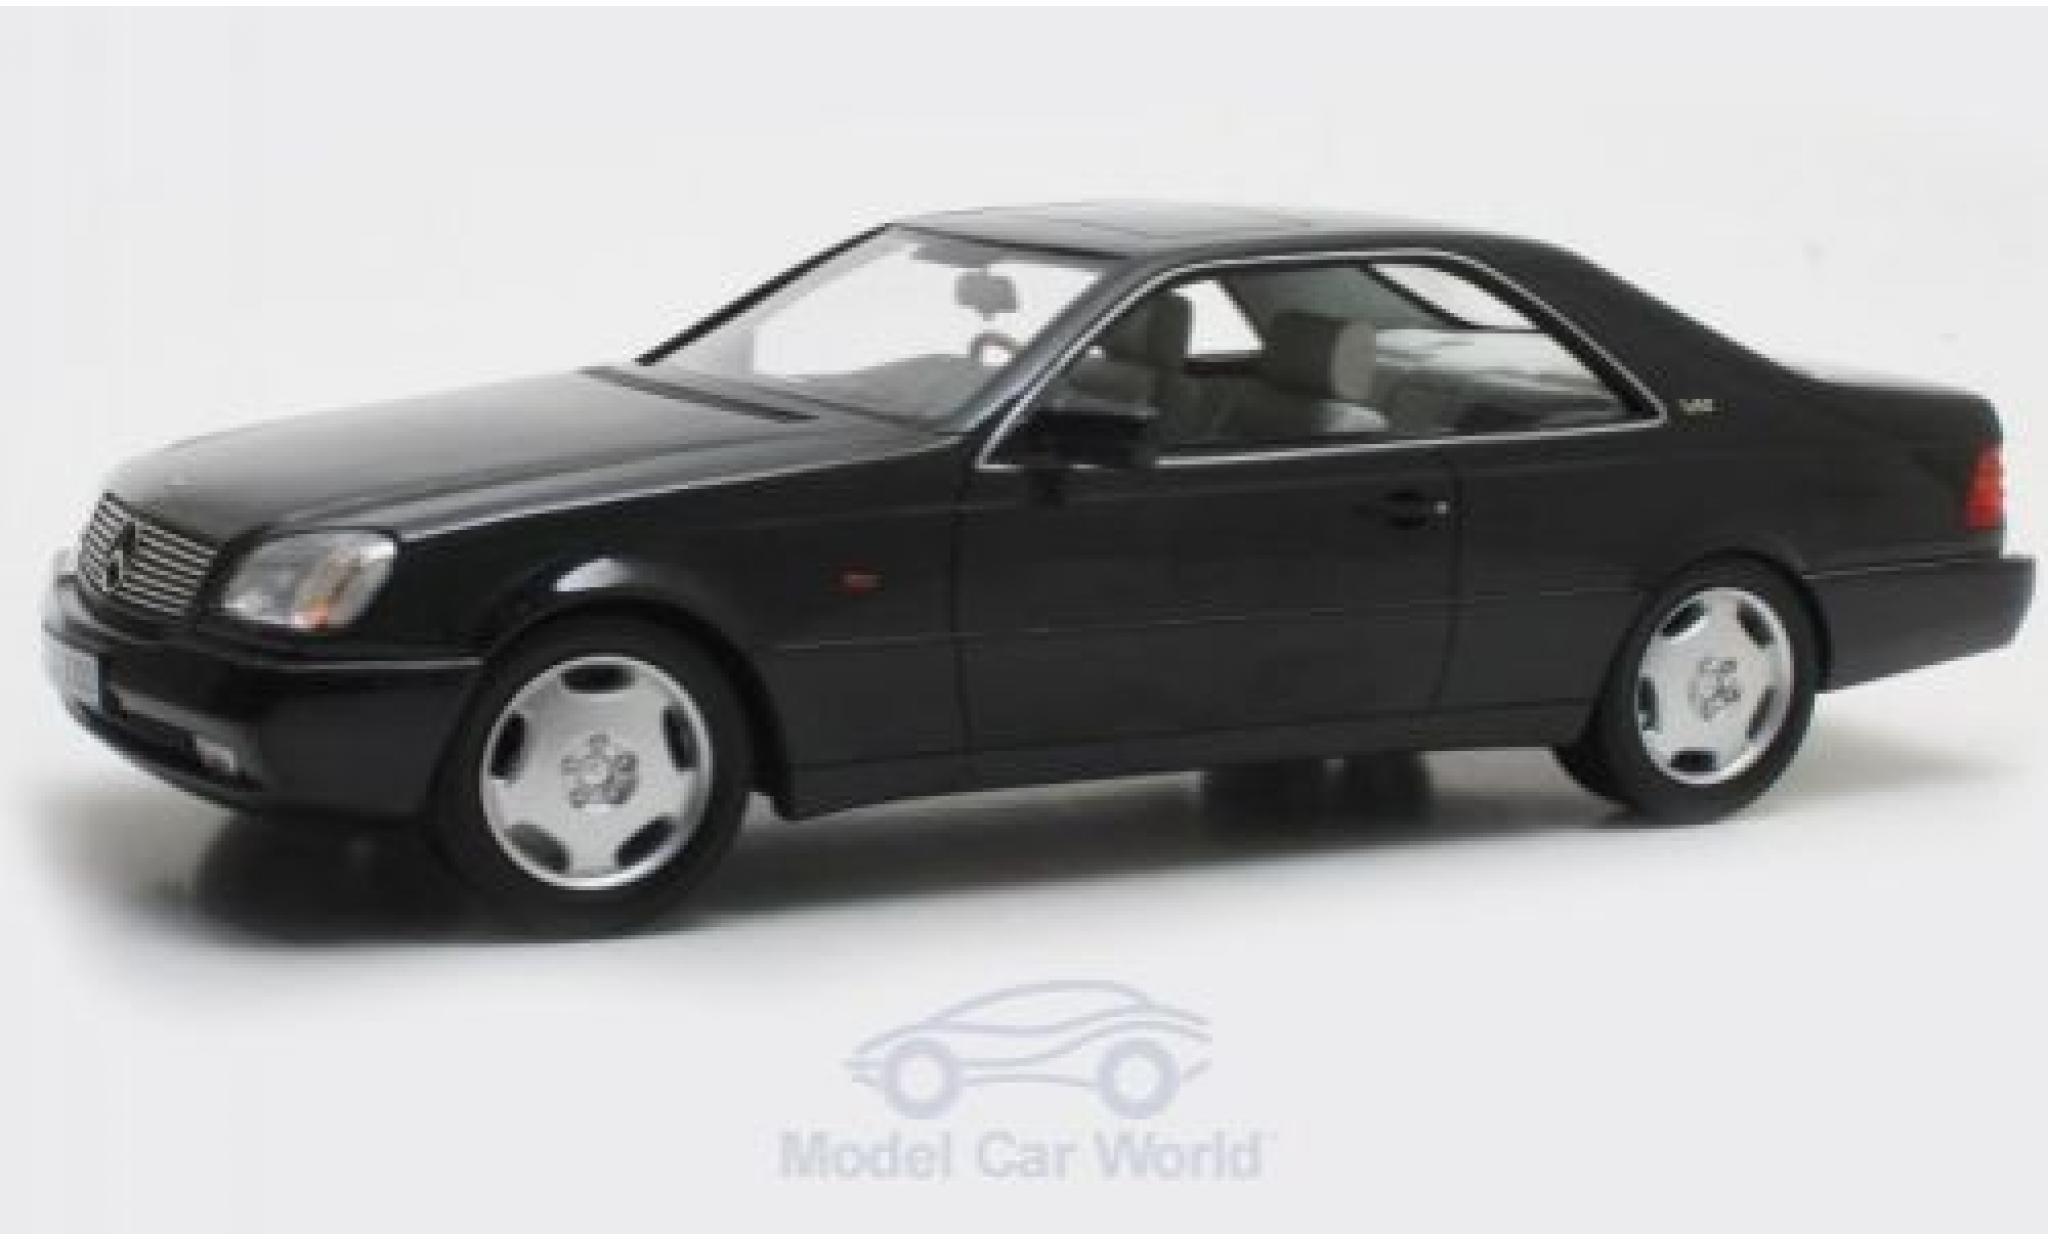 Mercedes 600 1/18 Cult Scale Models SEC (C140) metallise black 1992